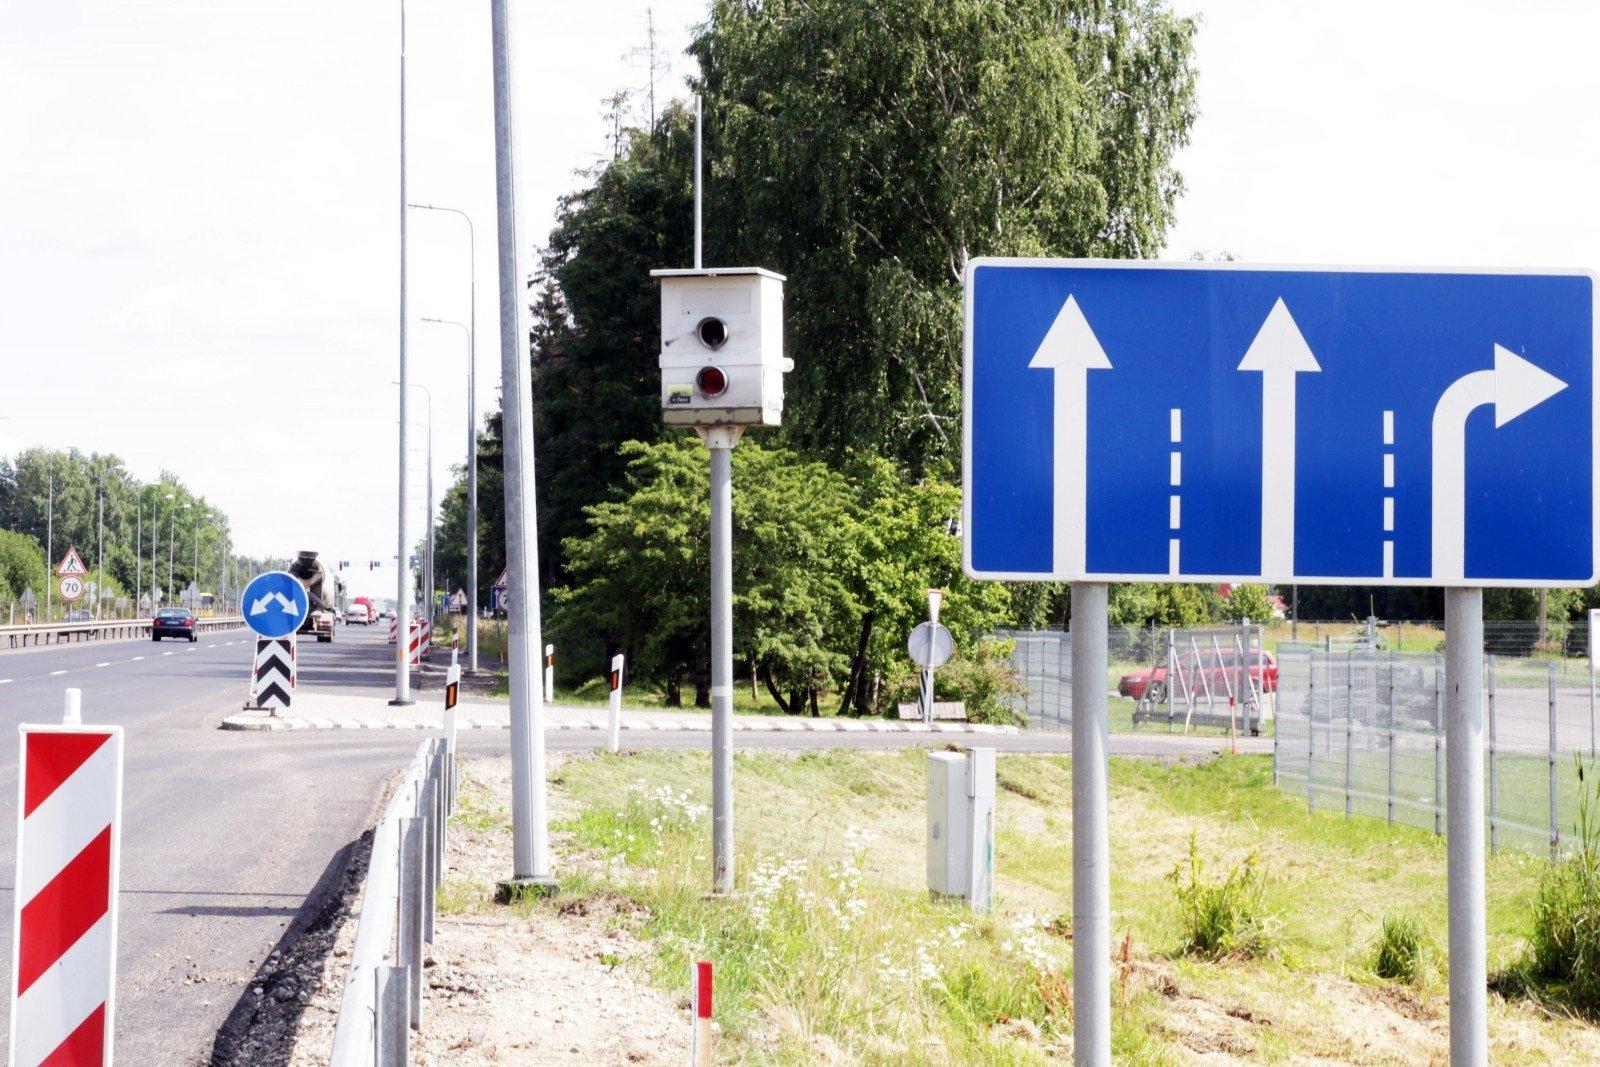 Литва запретила заезд ксебе натерриторию 44 русским